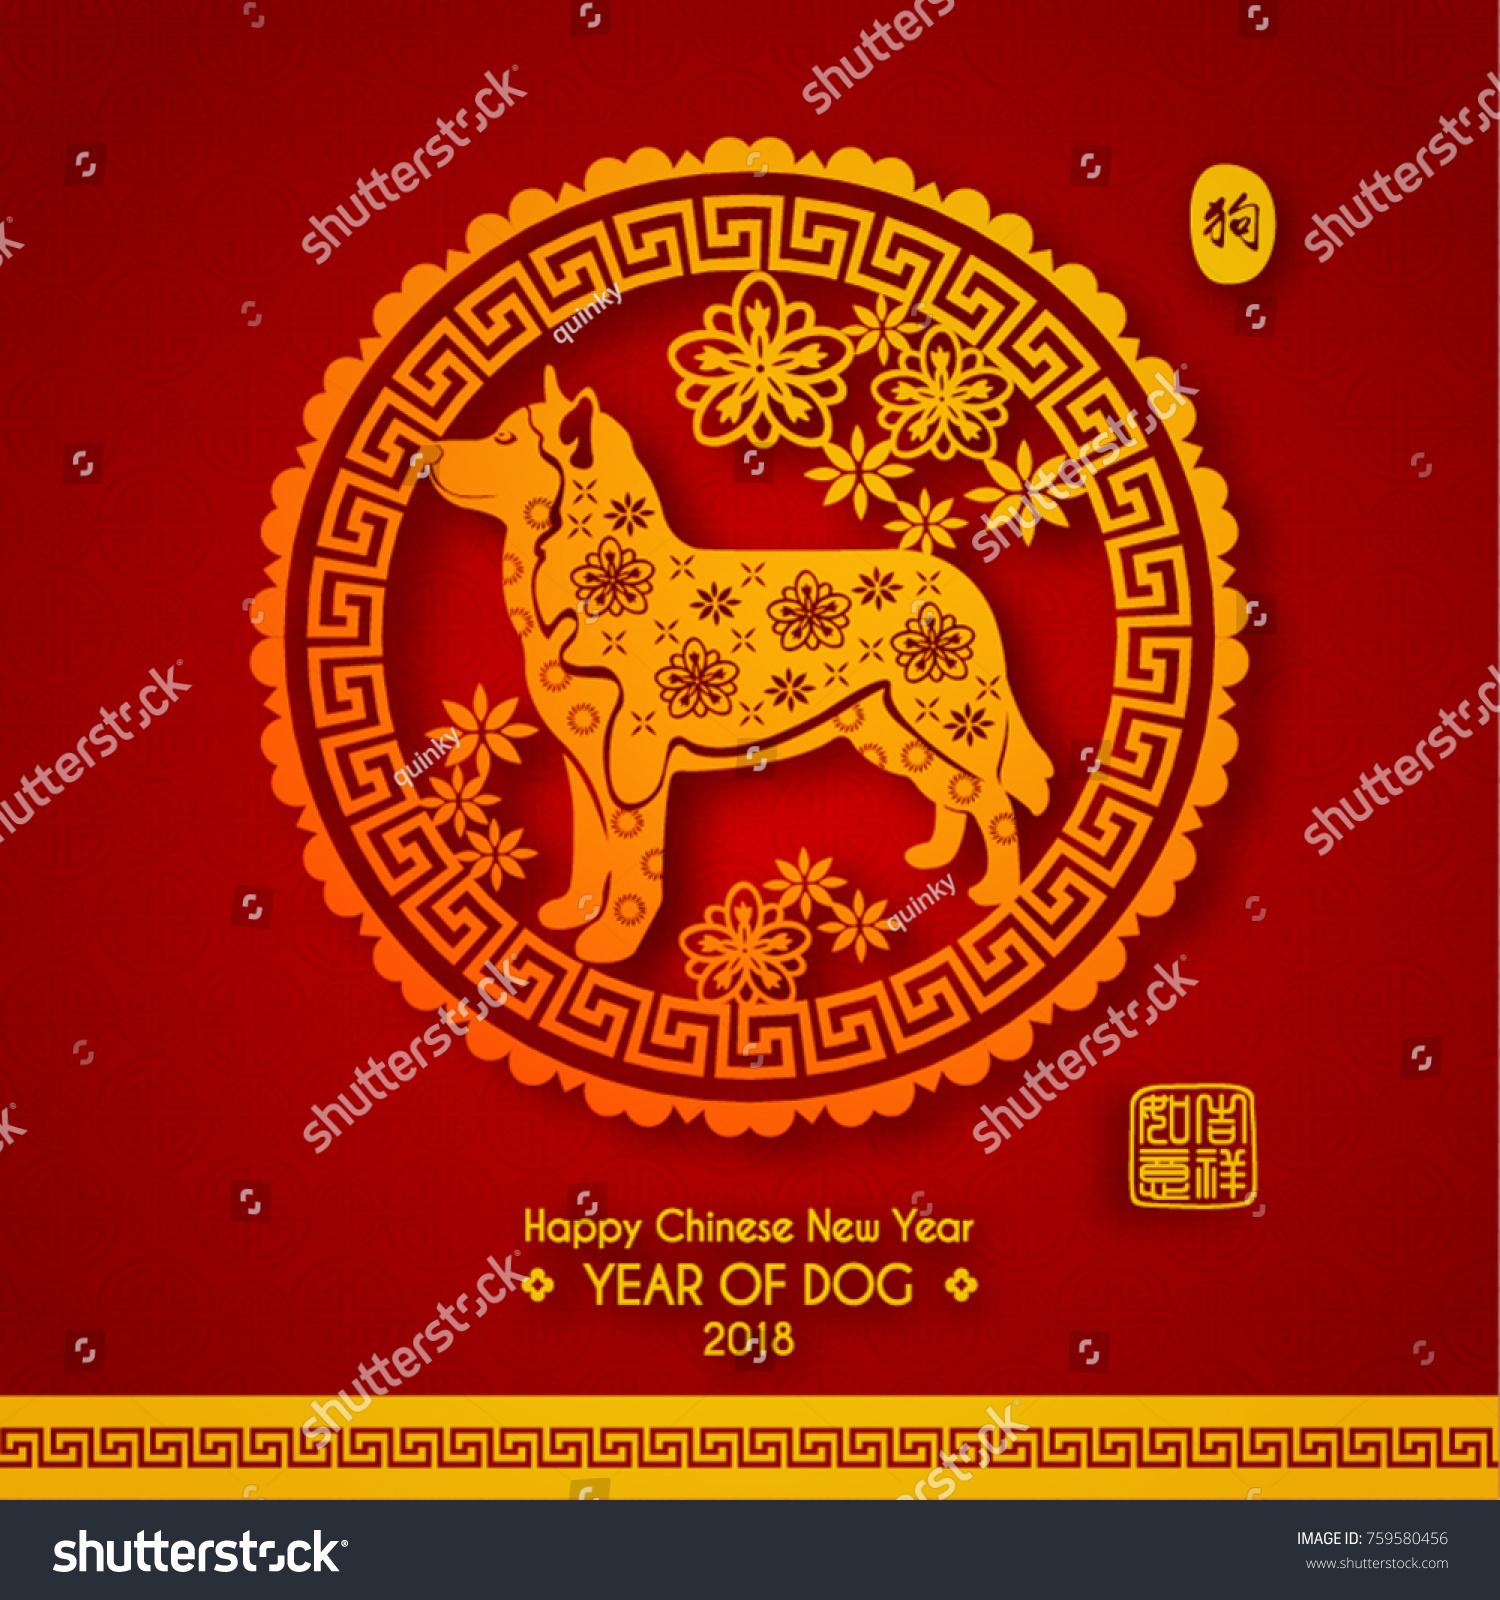 Chinese New Year 2018 Year Dog Stock-Vektorgrafik (Lizenzfrei ...